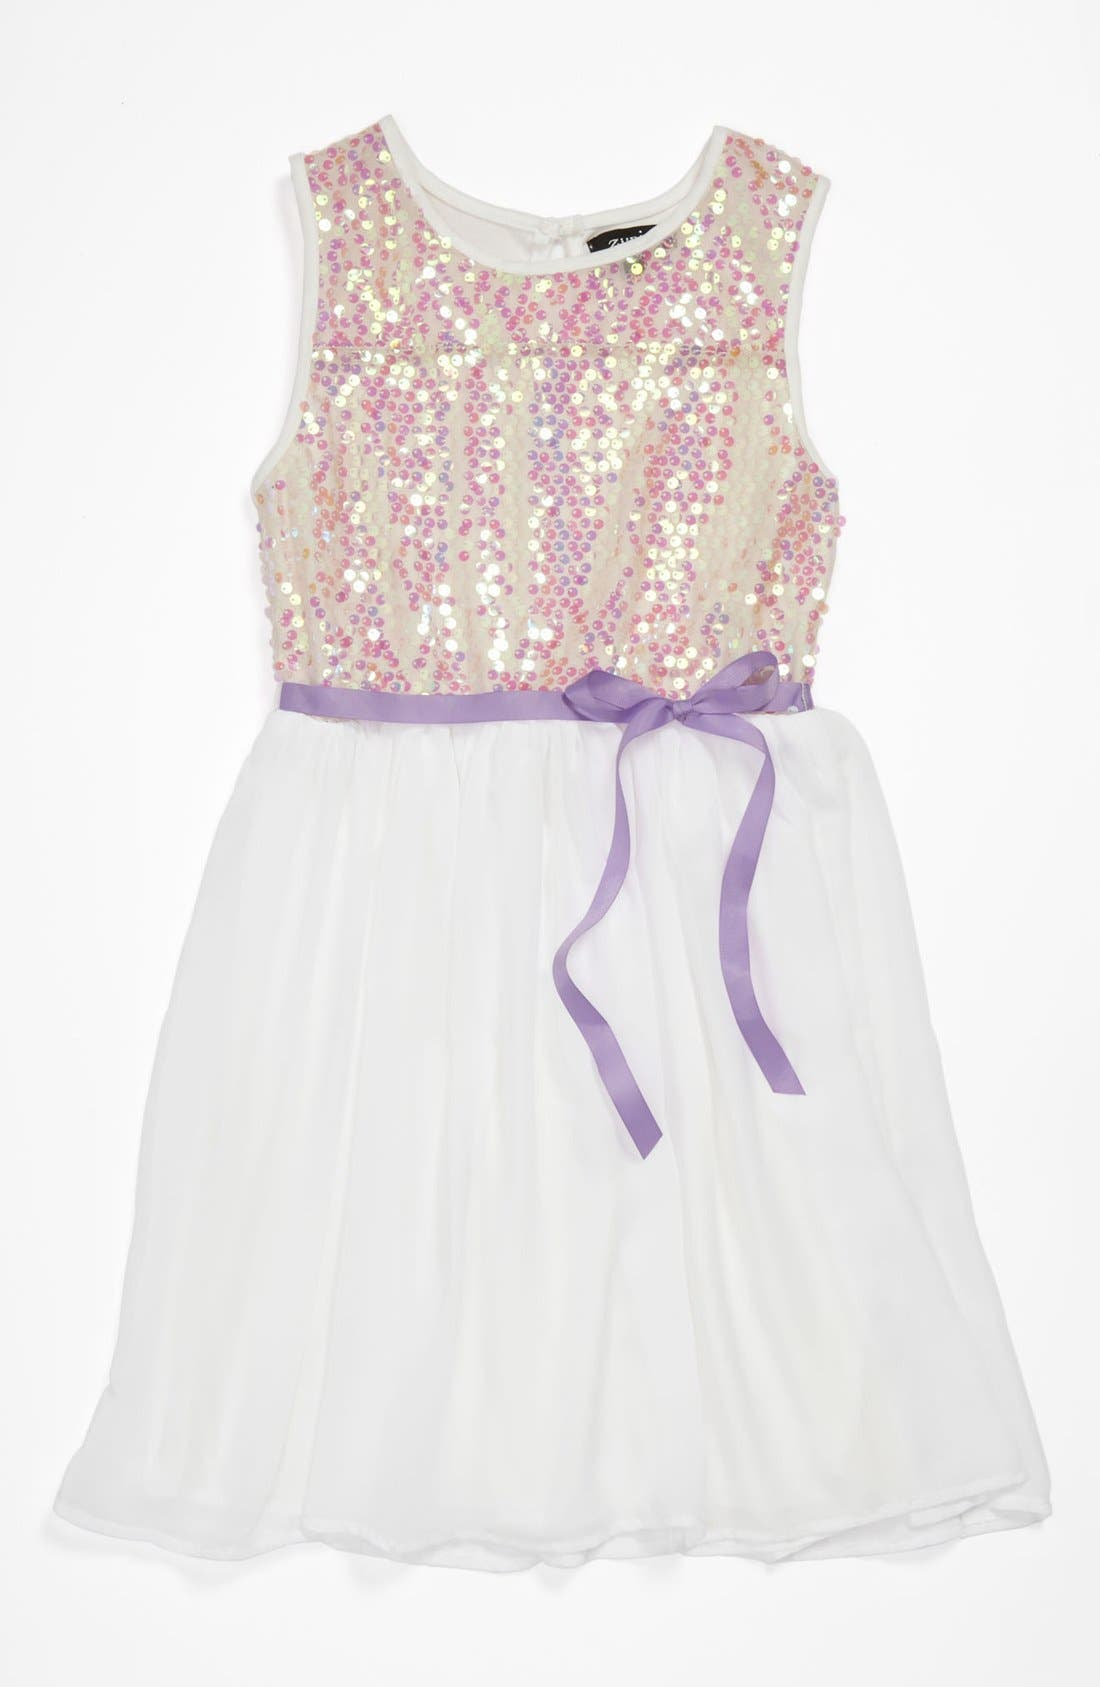 Alternate Image 1 Selected - Zunie Sleeveless Skater Dress (Big Girls)